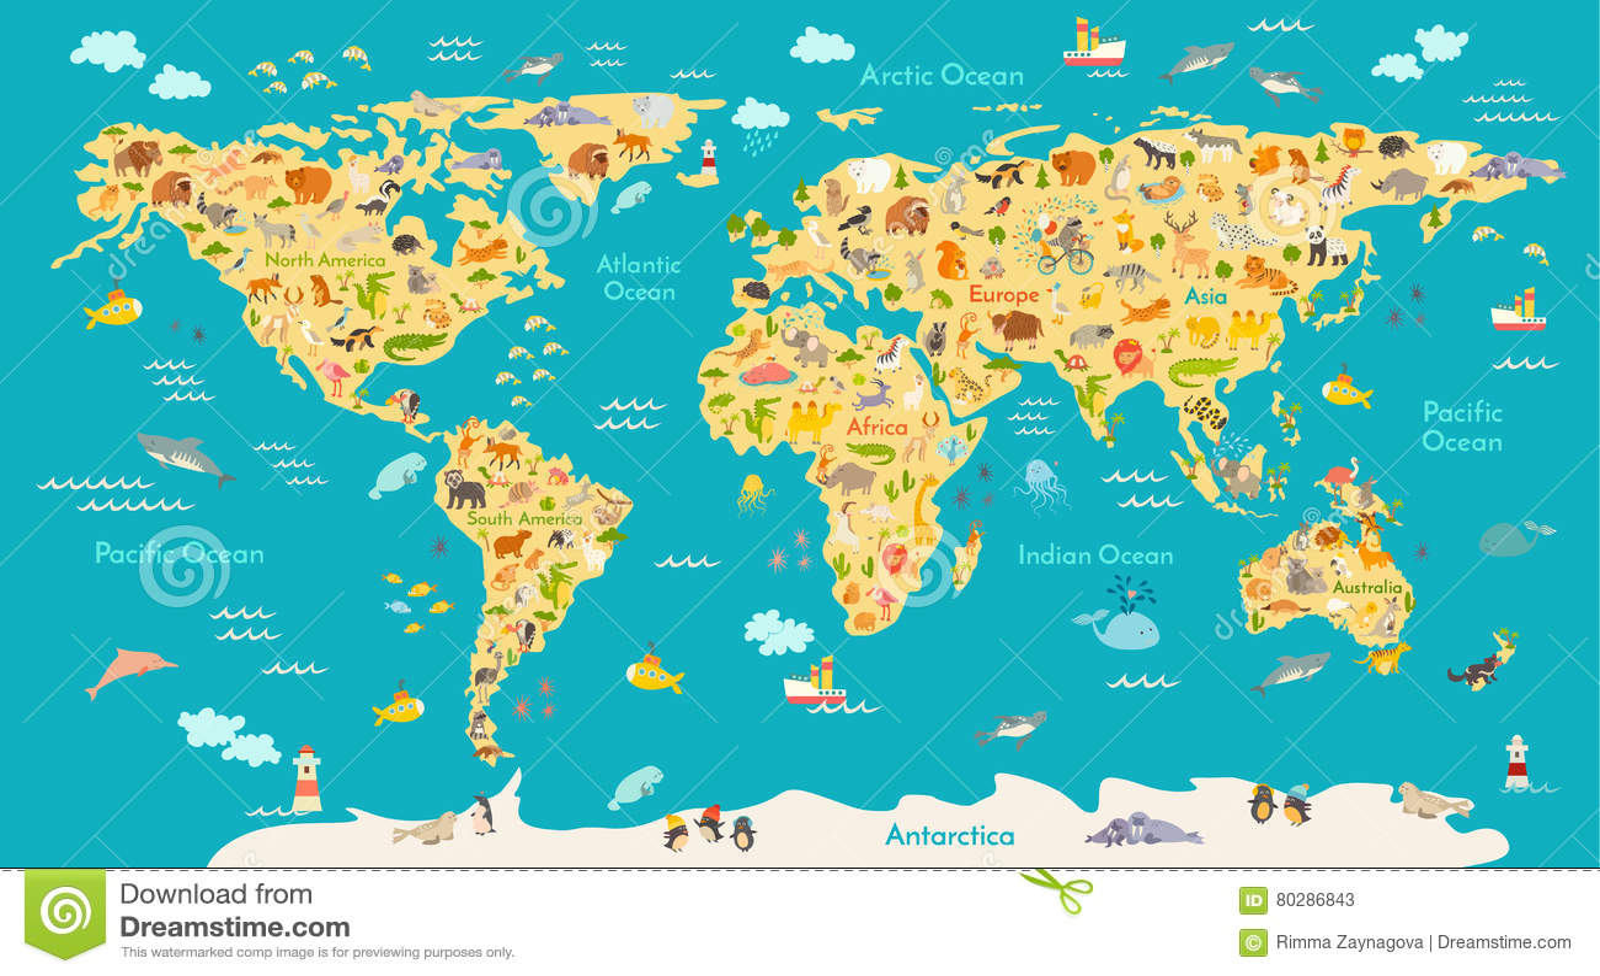 animal map for kid world vector poster for children cute. Black Bedroom Furniture Sets. Home Design Ideas